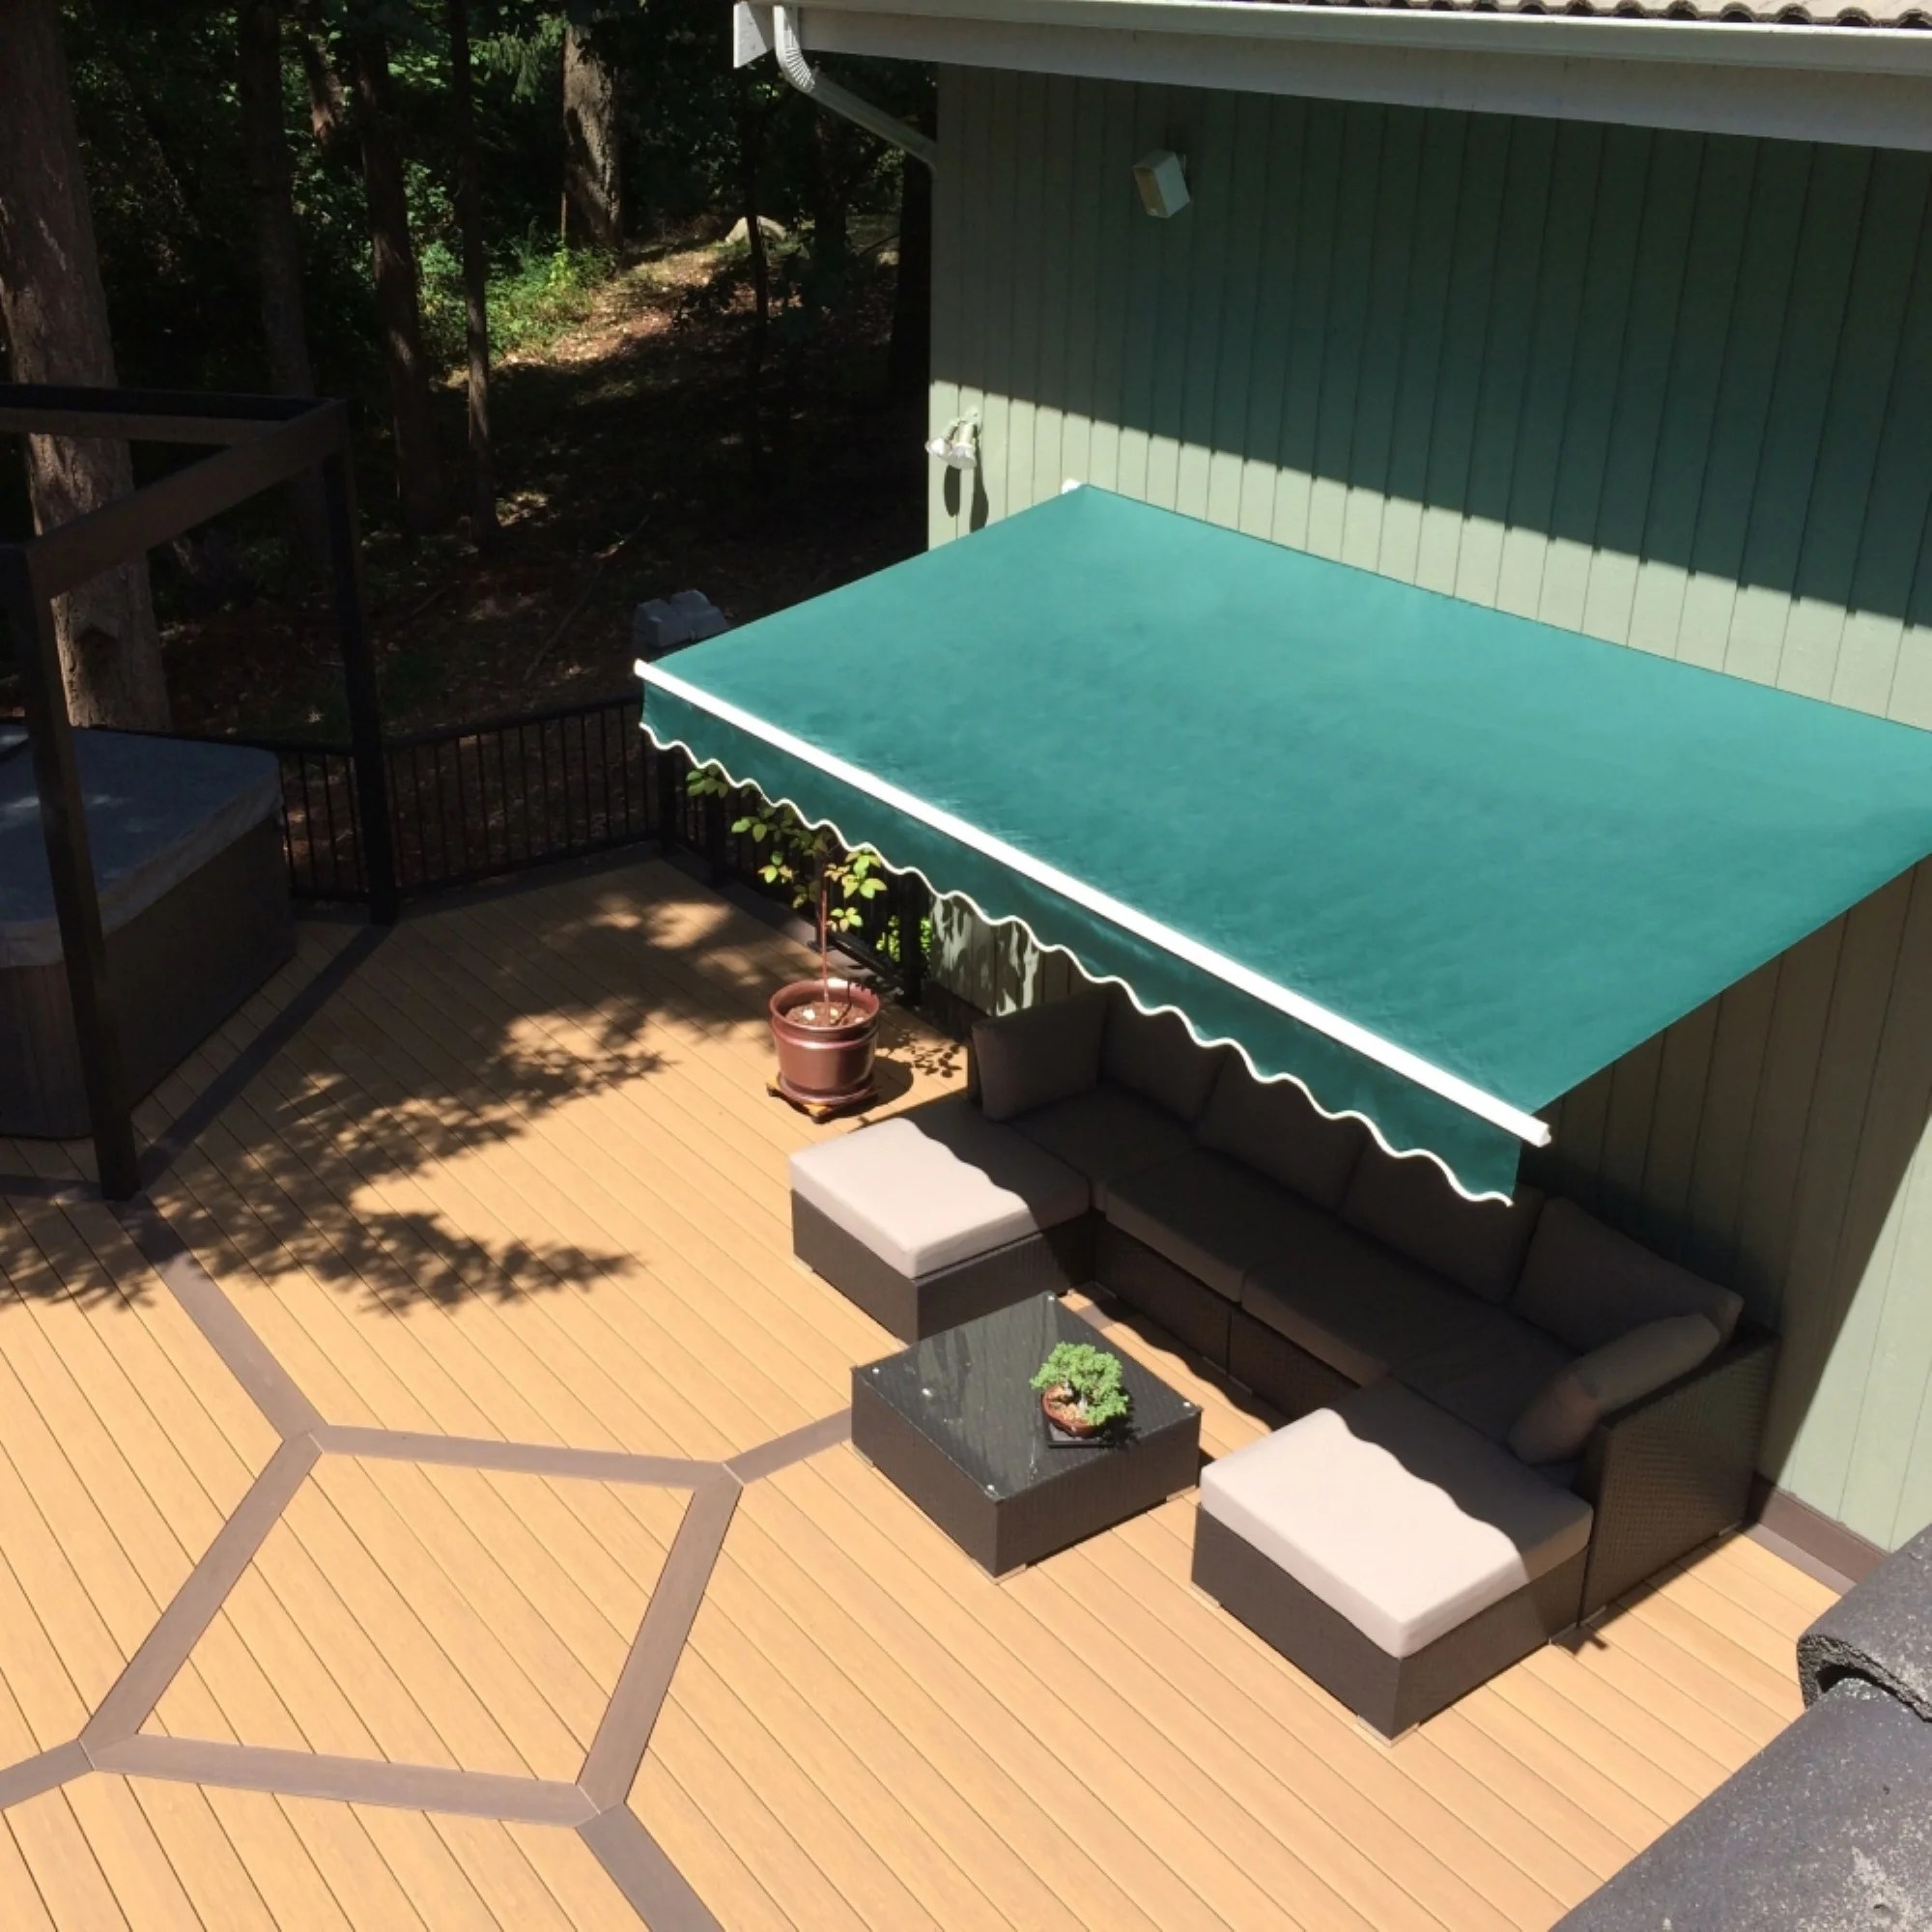 aleko 10x8 feet retractable outdoor patio awning deck sunshade green